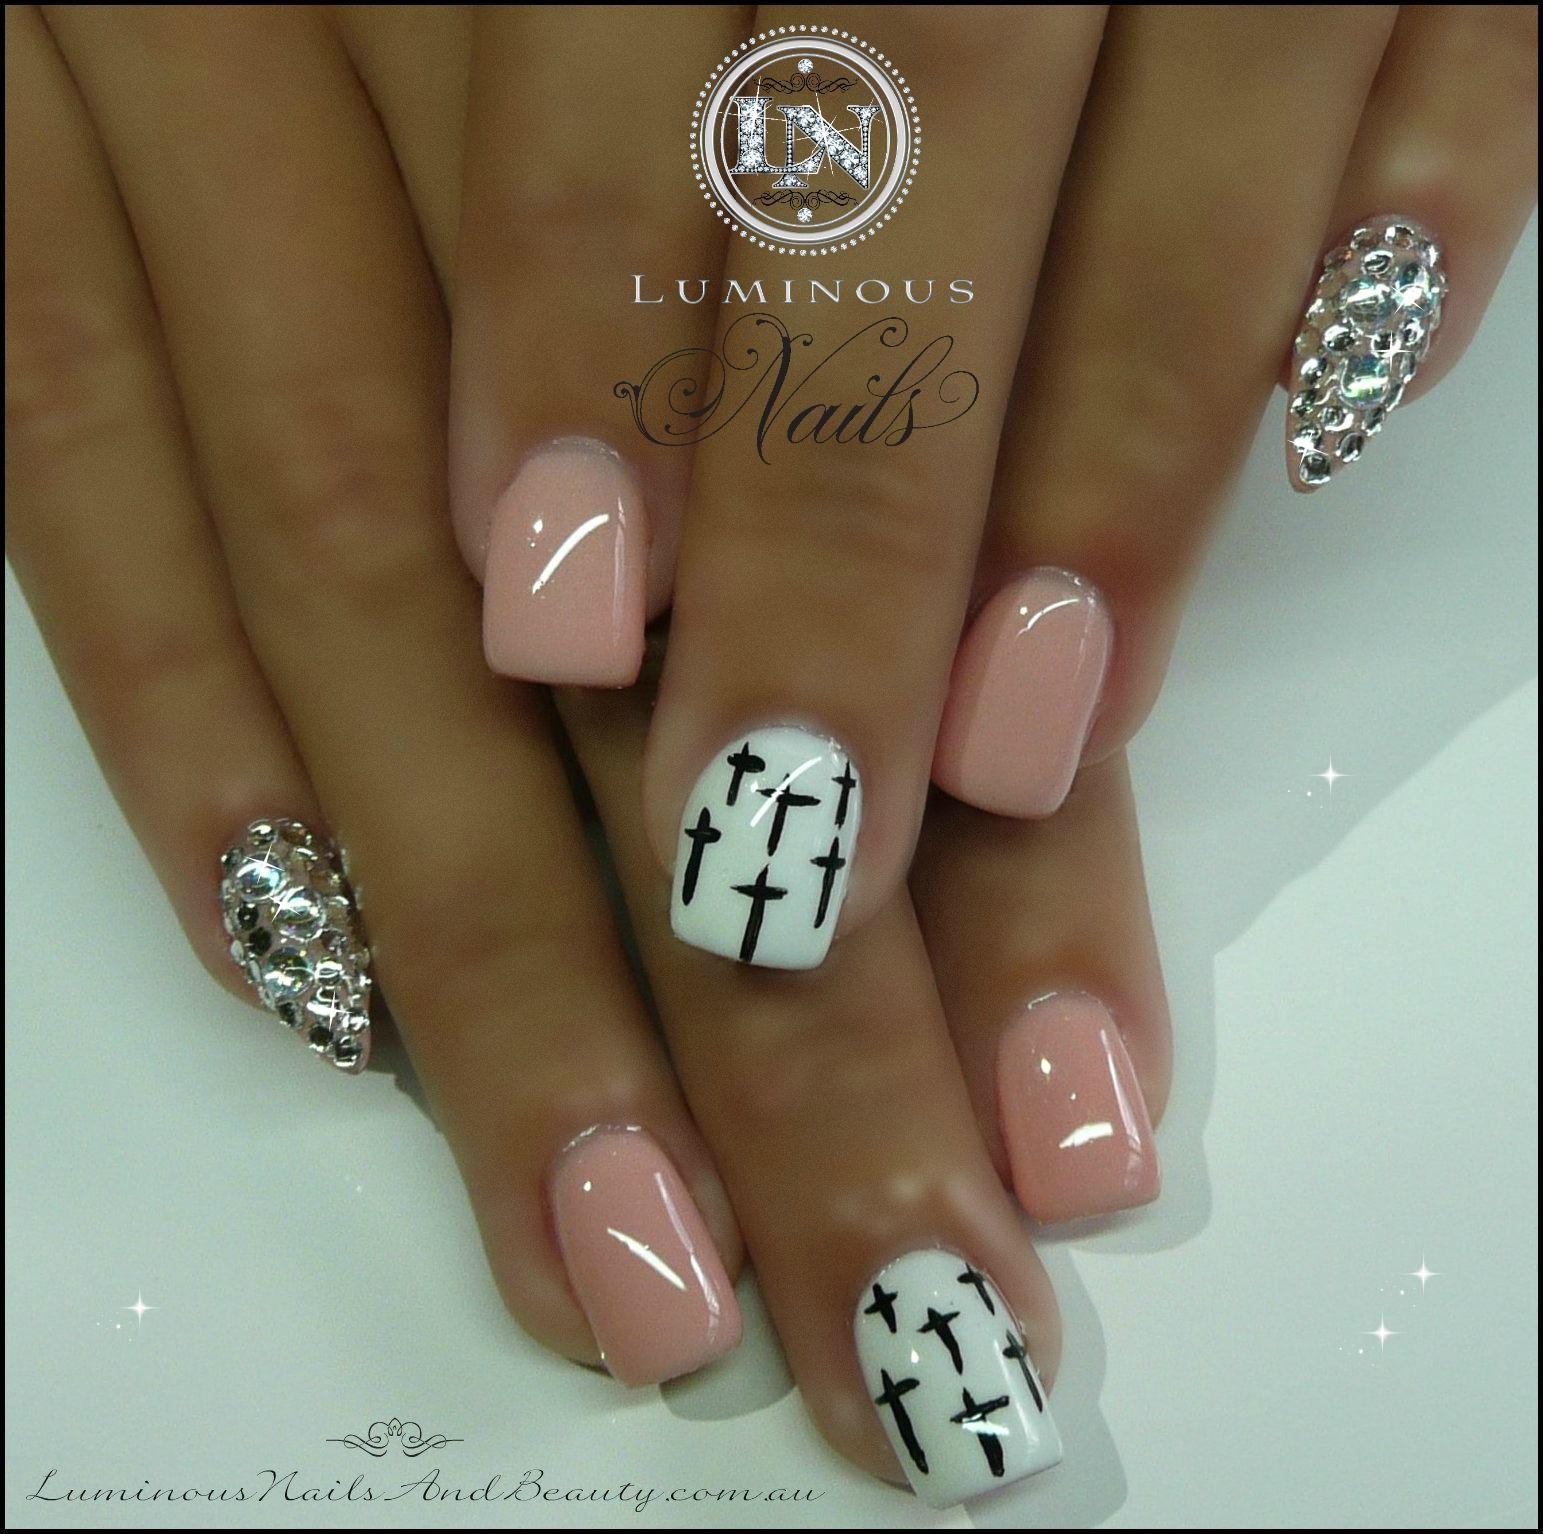 Art images - Luminous-nails-beauty-gold-coast-queensland.-acrylic-gel-nails-spray